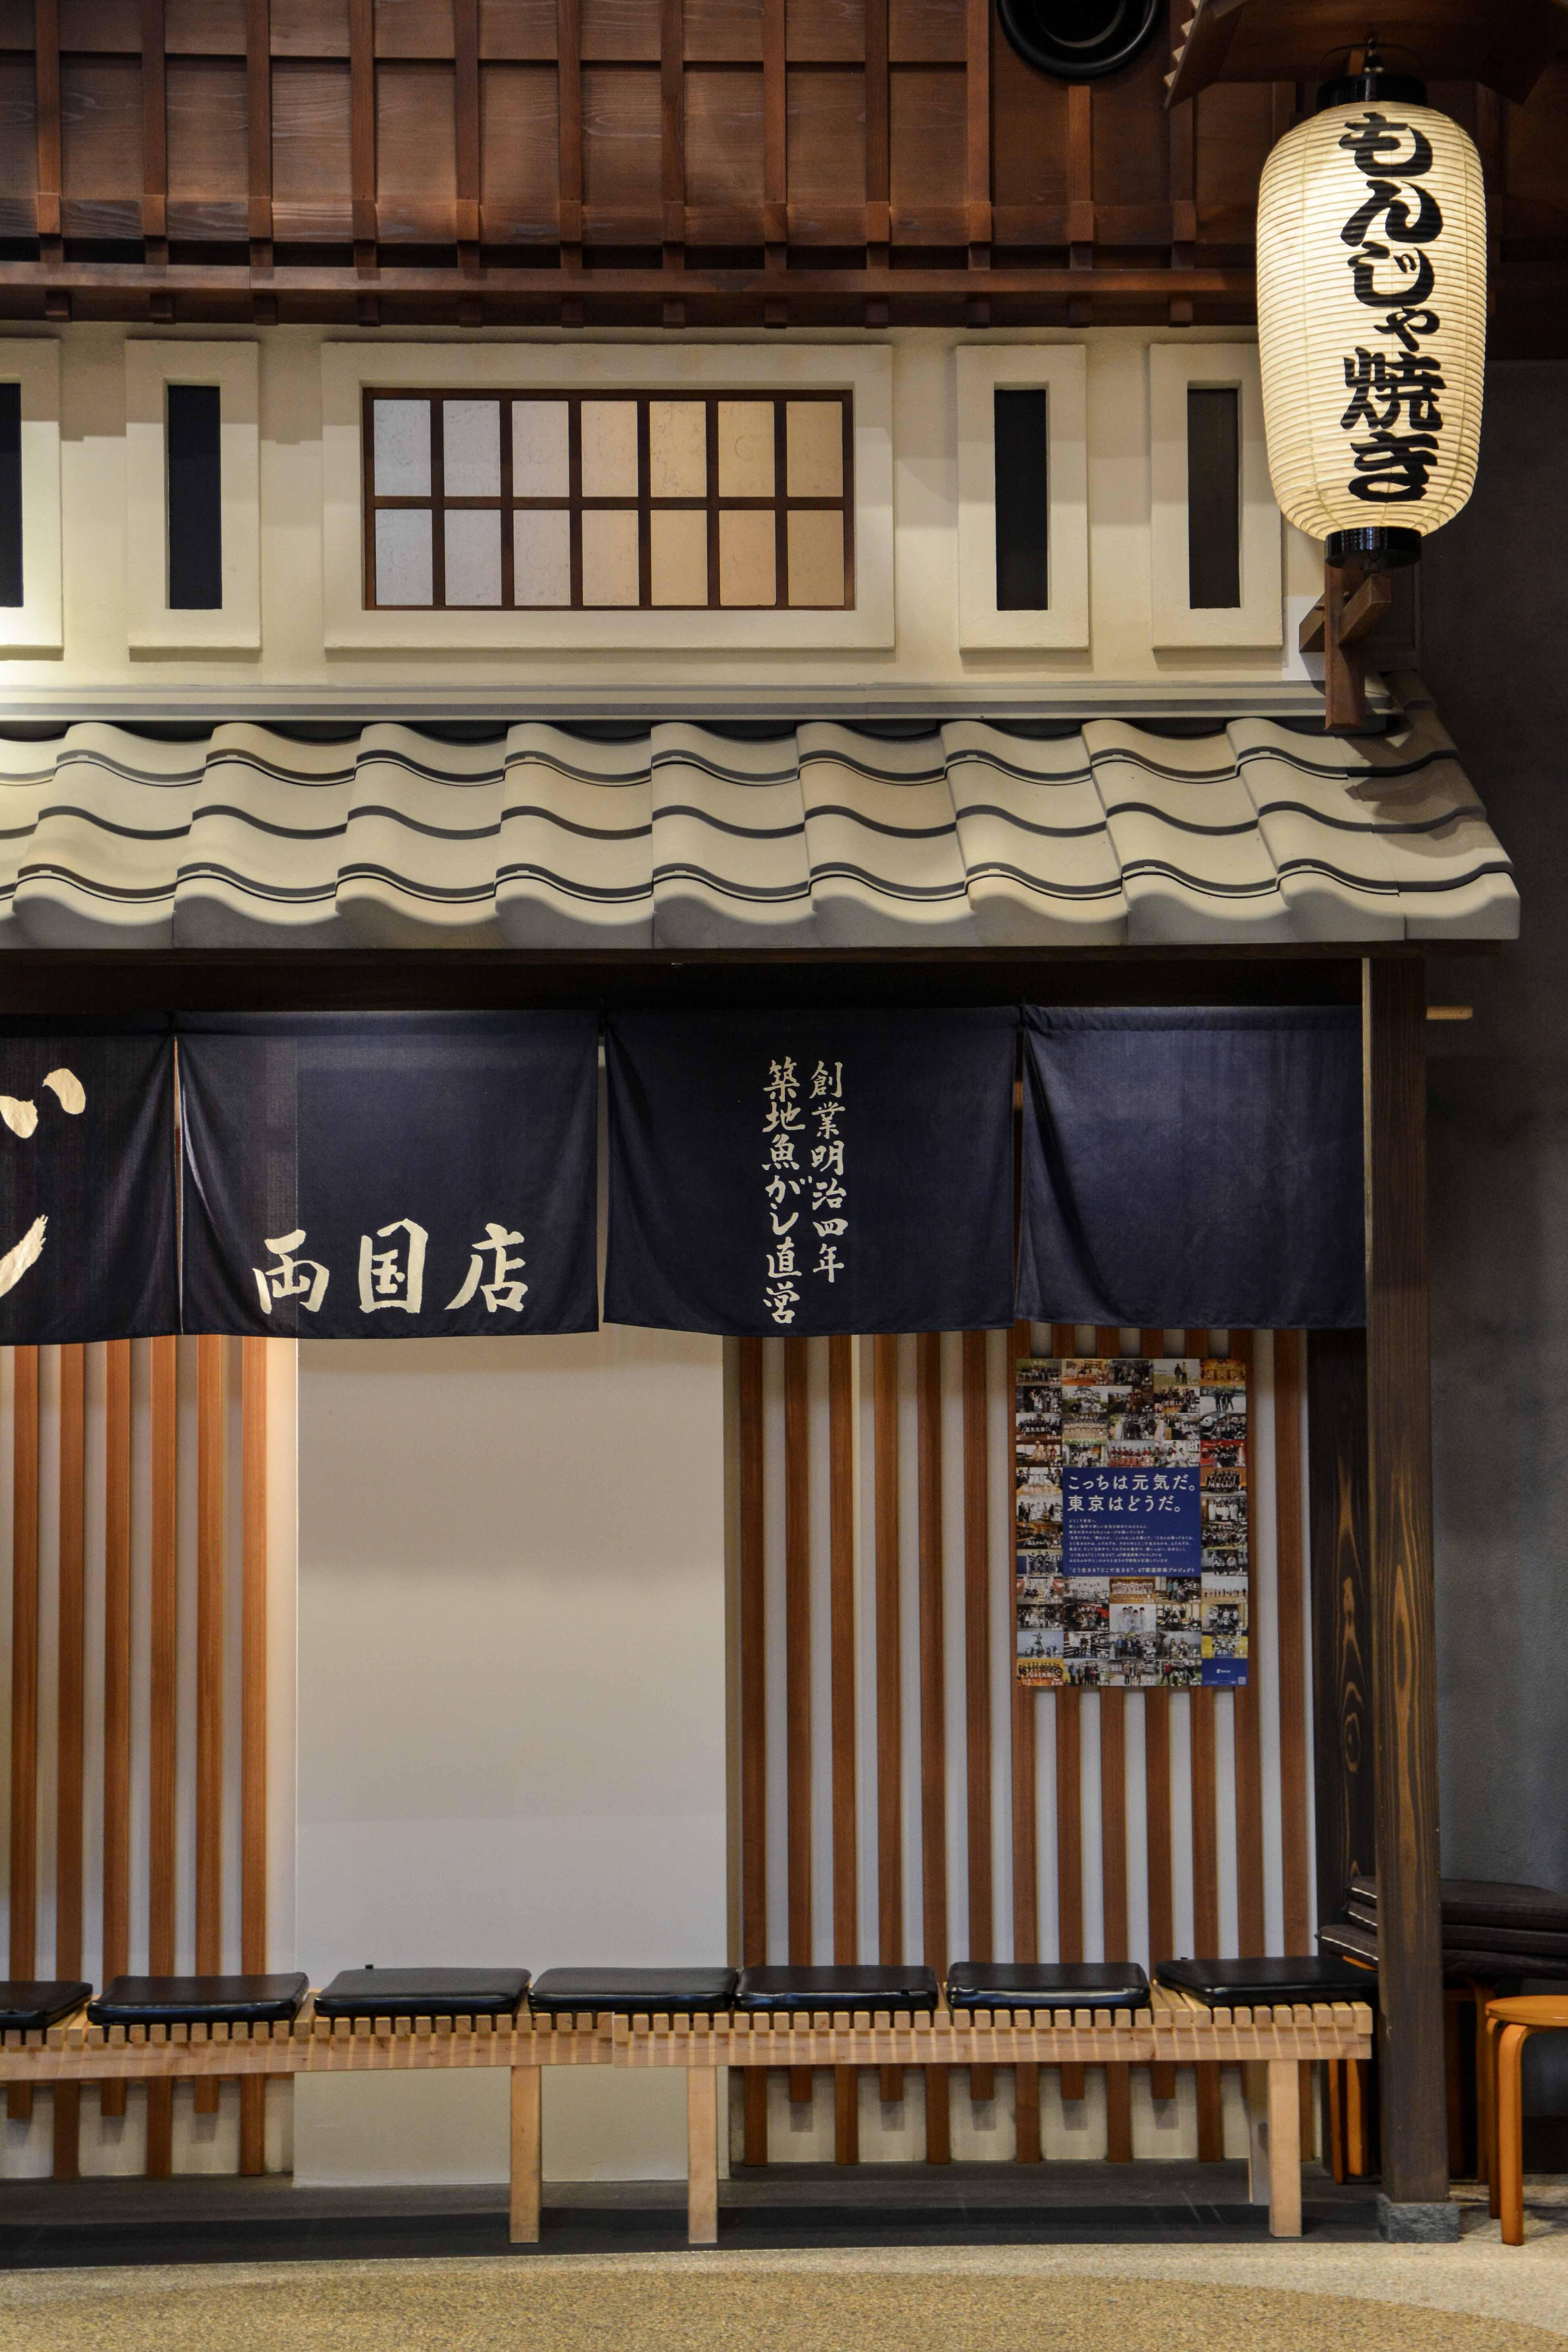 voyae au japon, à Tokyo avec le Ryogoku Edo Noren